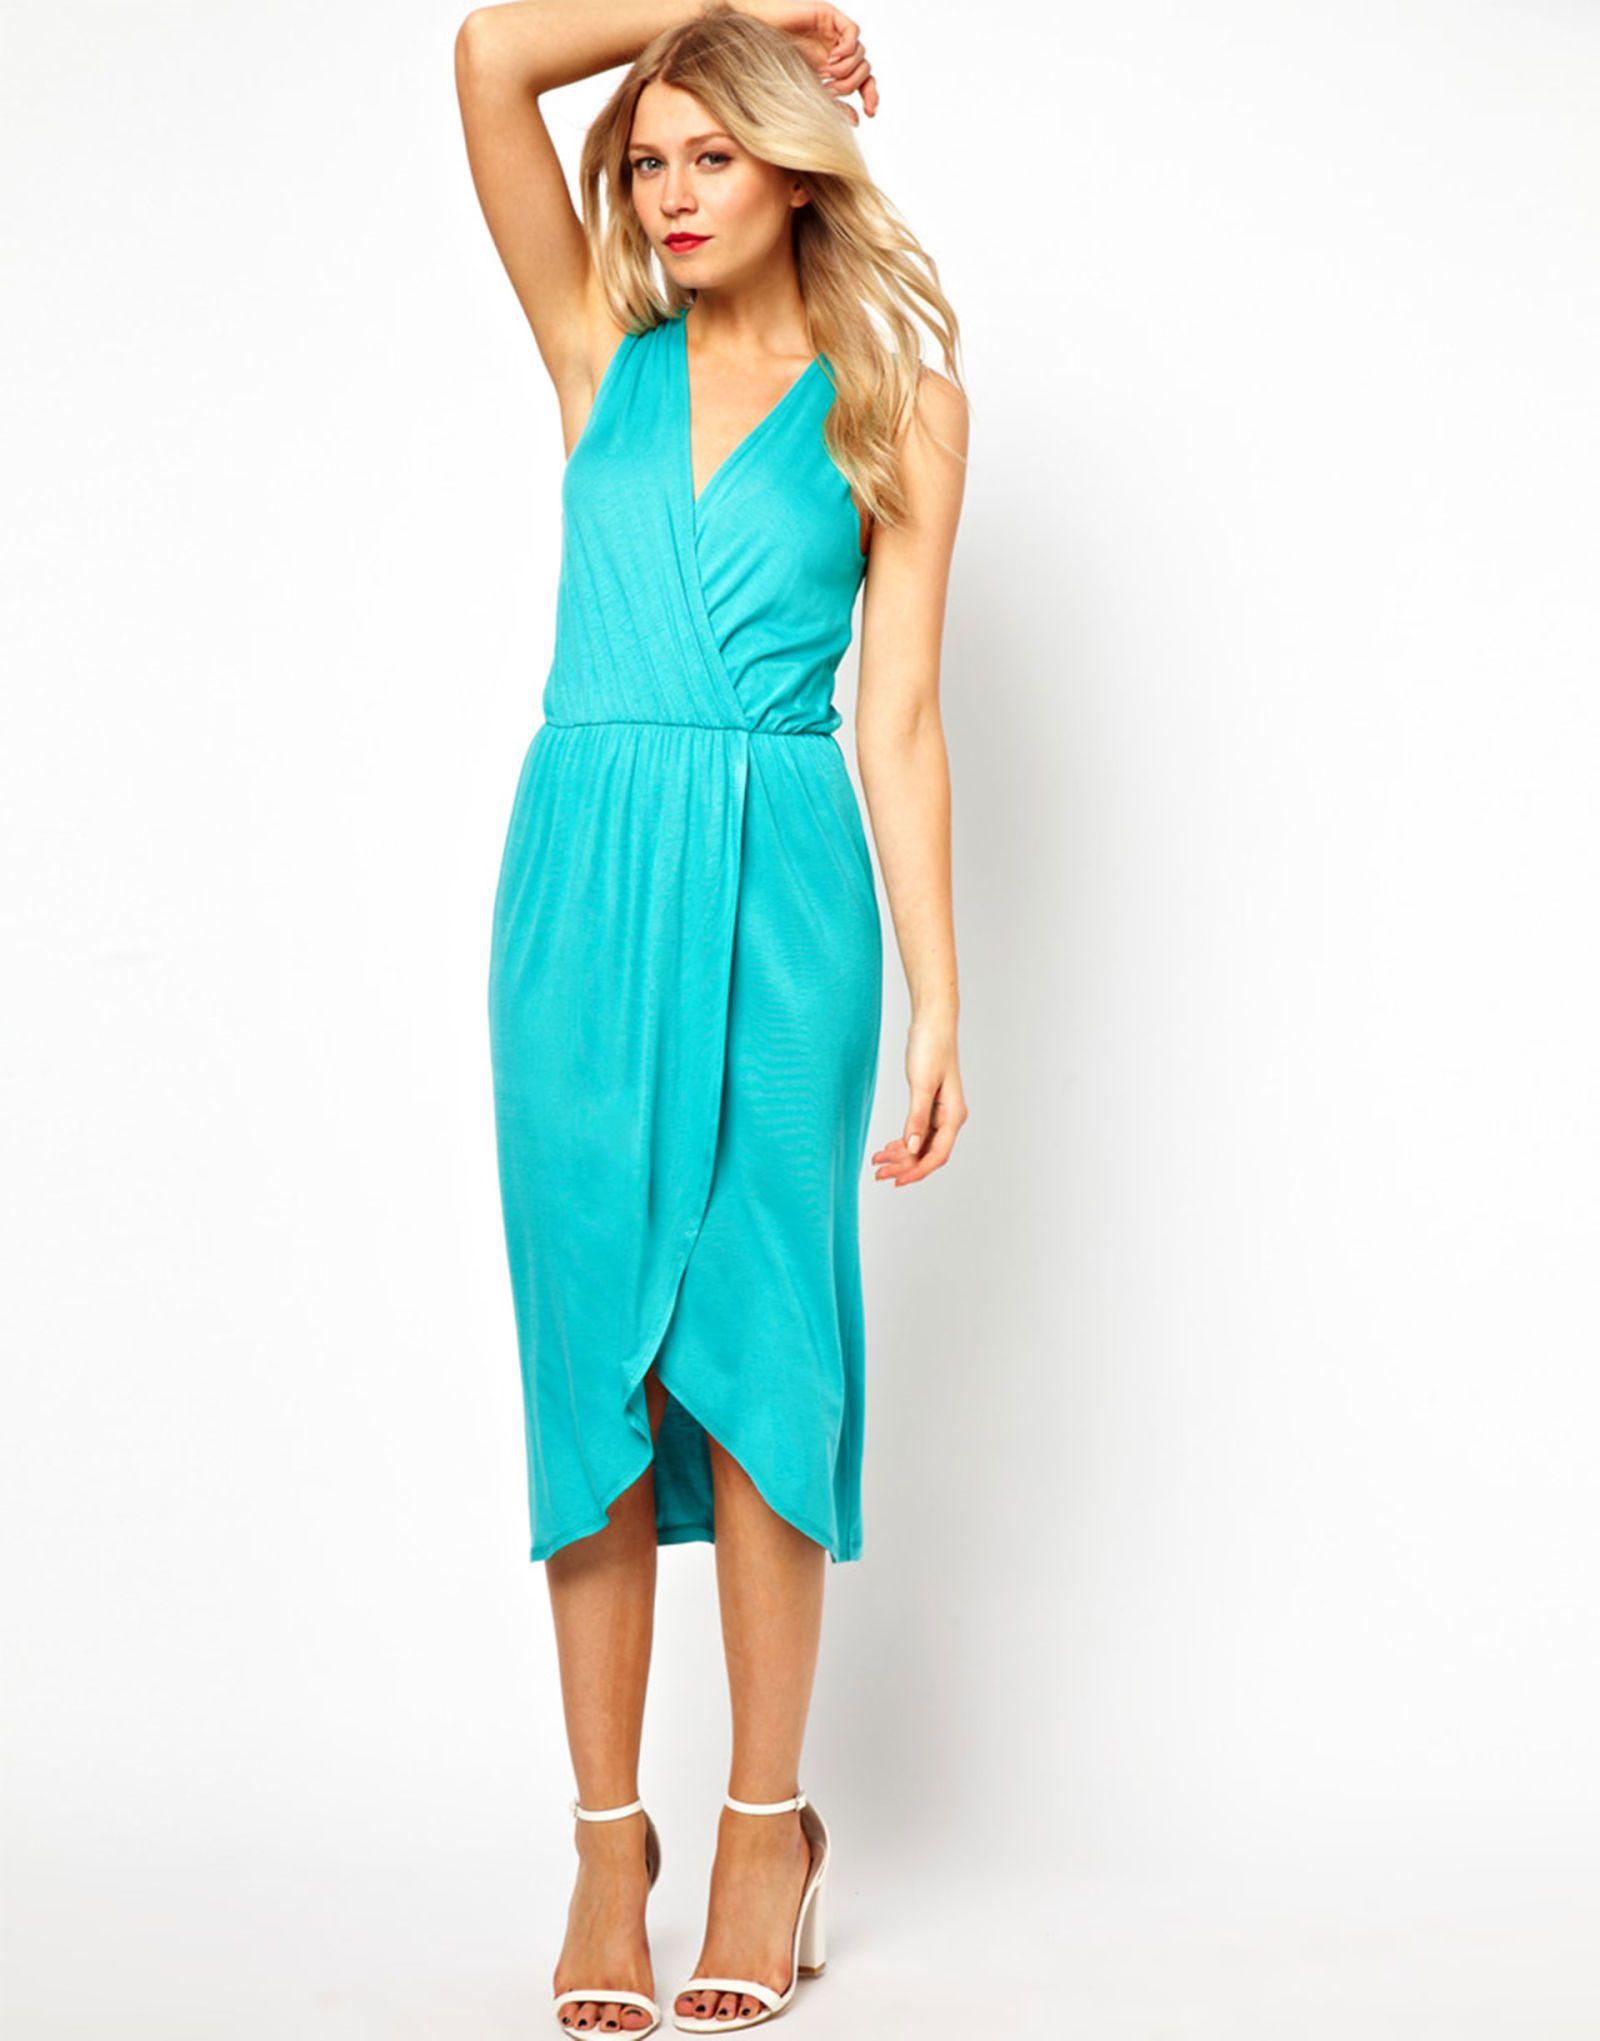 Comfortable Dresses - Easy Summer Dresses